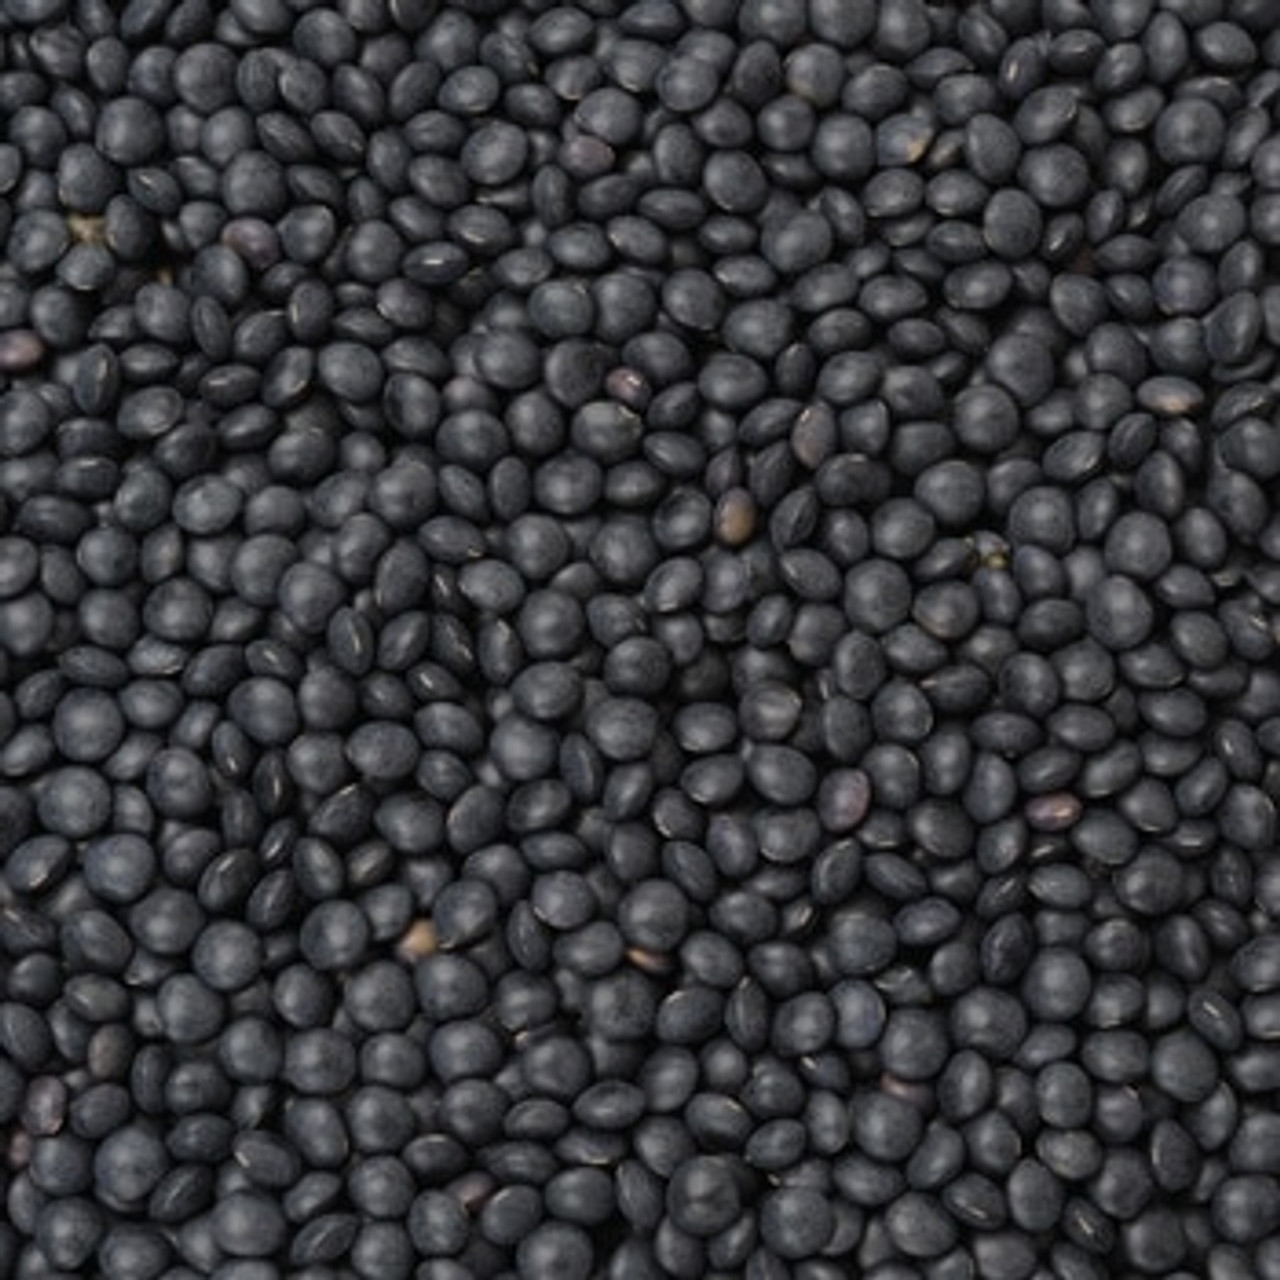 Bulk Organic Black Beluga Lentils 25kg Pre Order Item Fresco Wholefoods